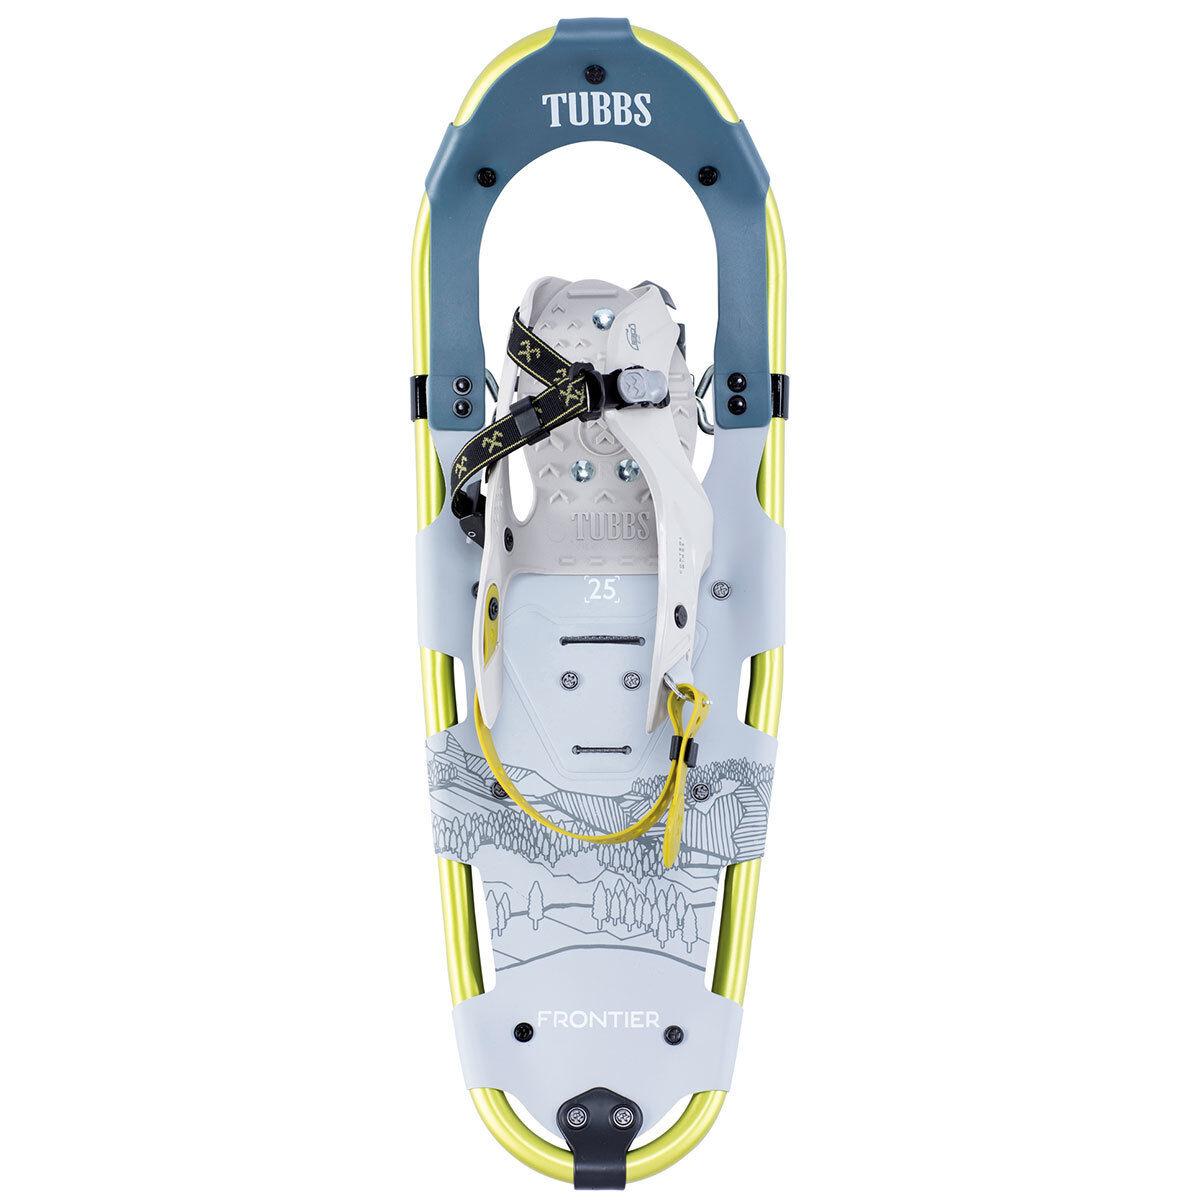 Tubbs Frontier Series